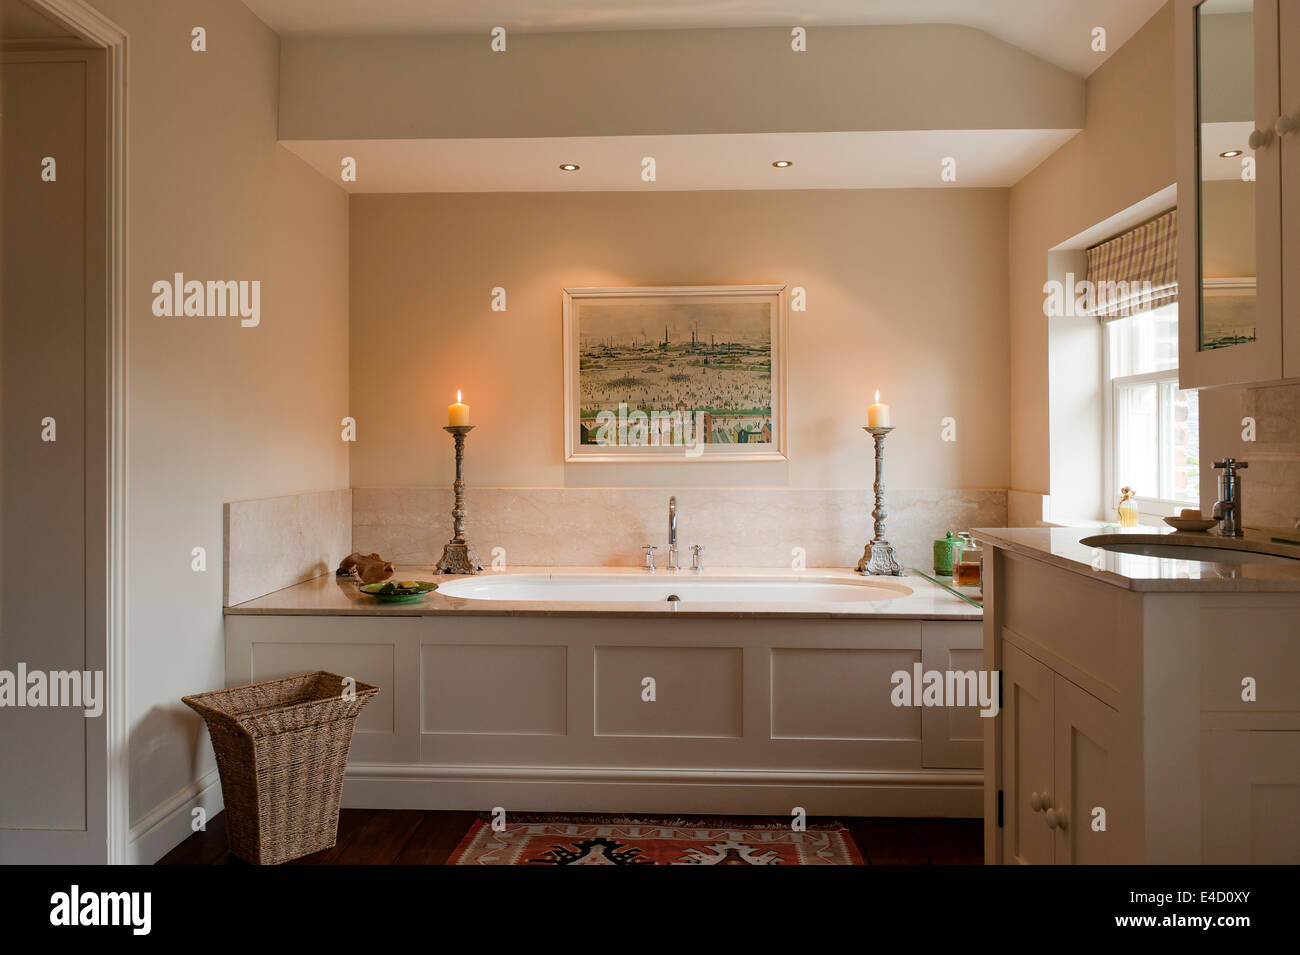 Vasca Da Bagno Francia : Una tranquilla sala da bagno la vasca da bagno è stata nascosta da